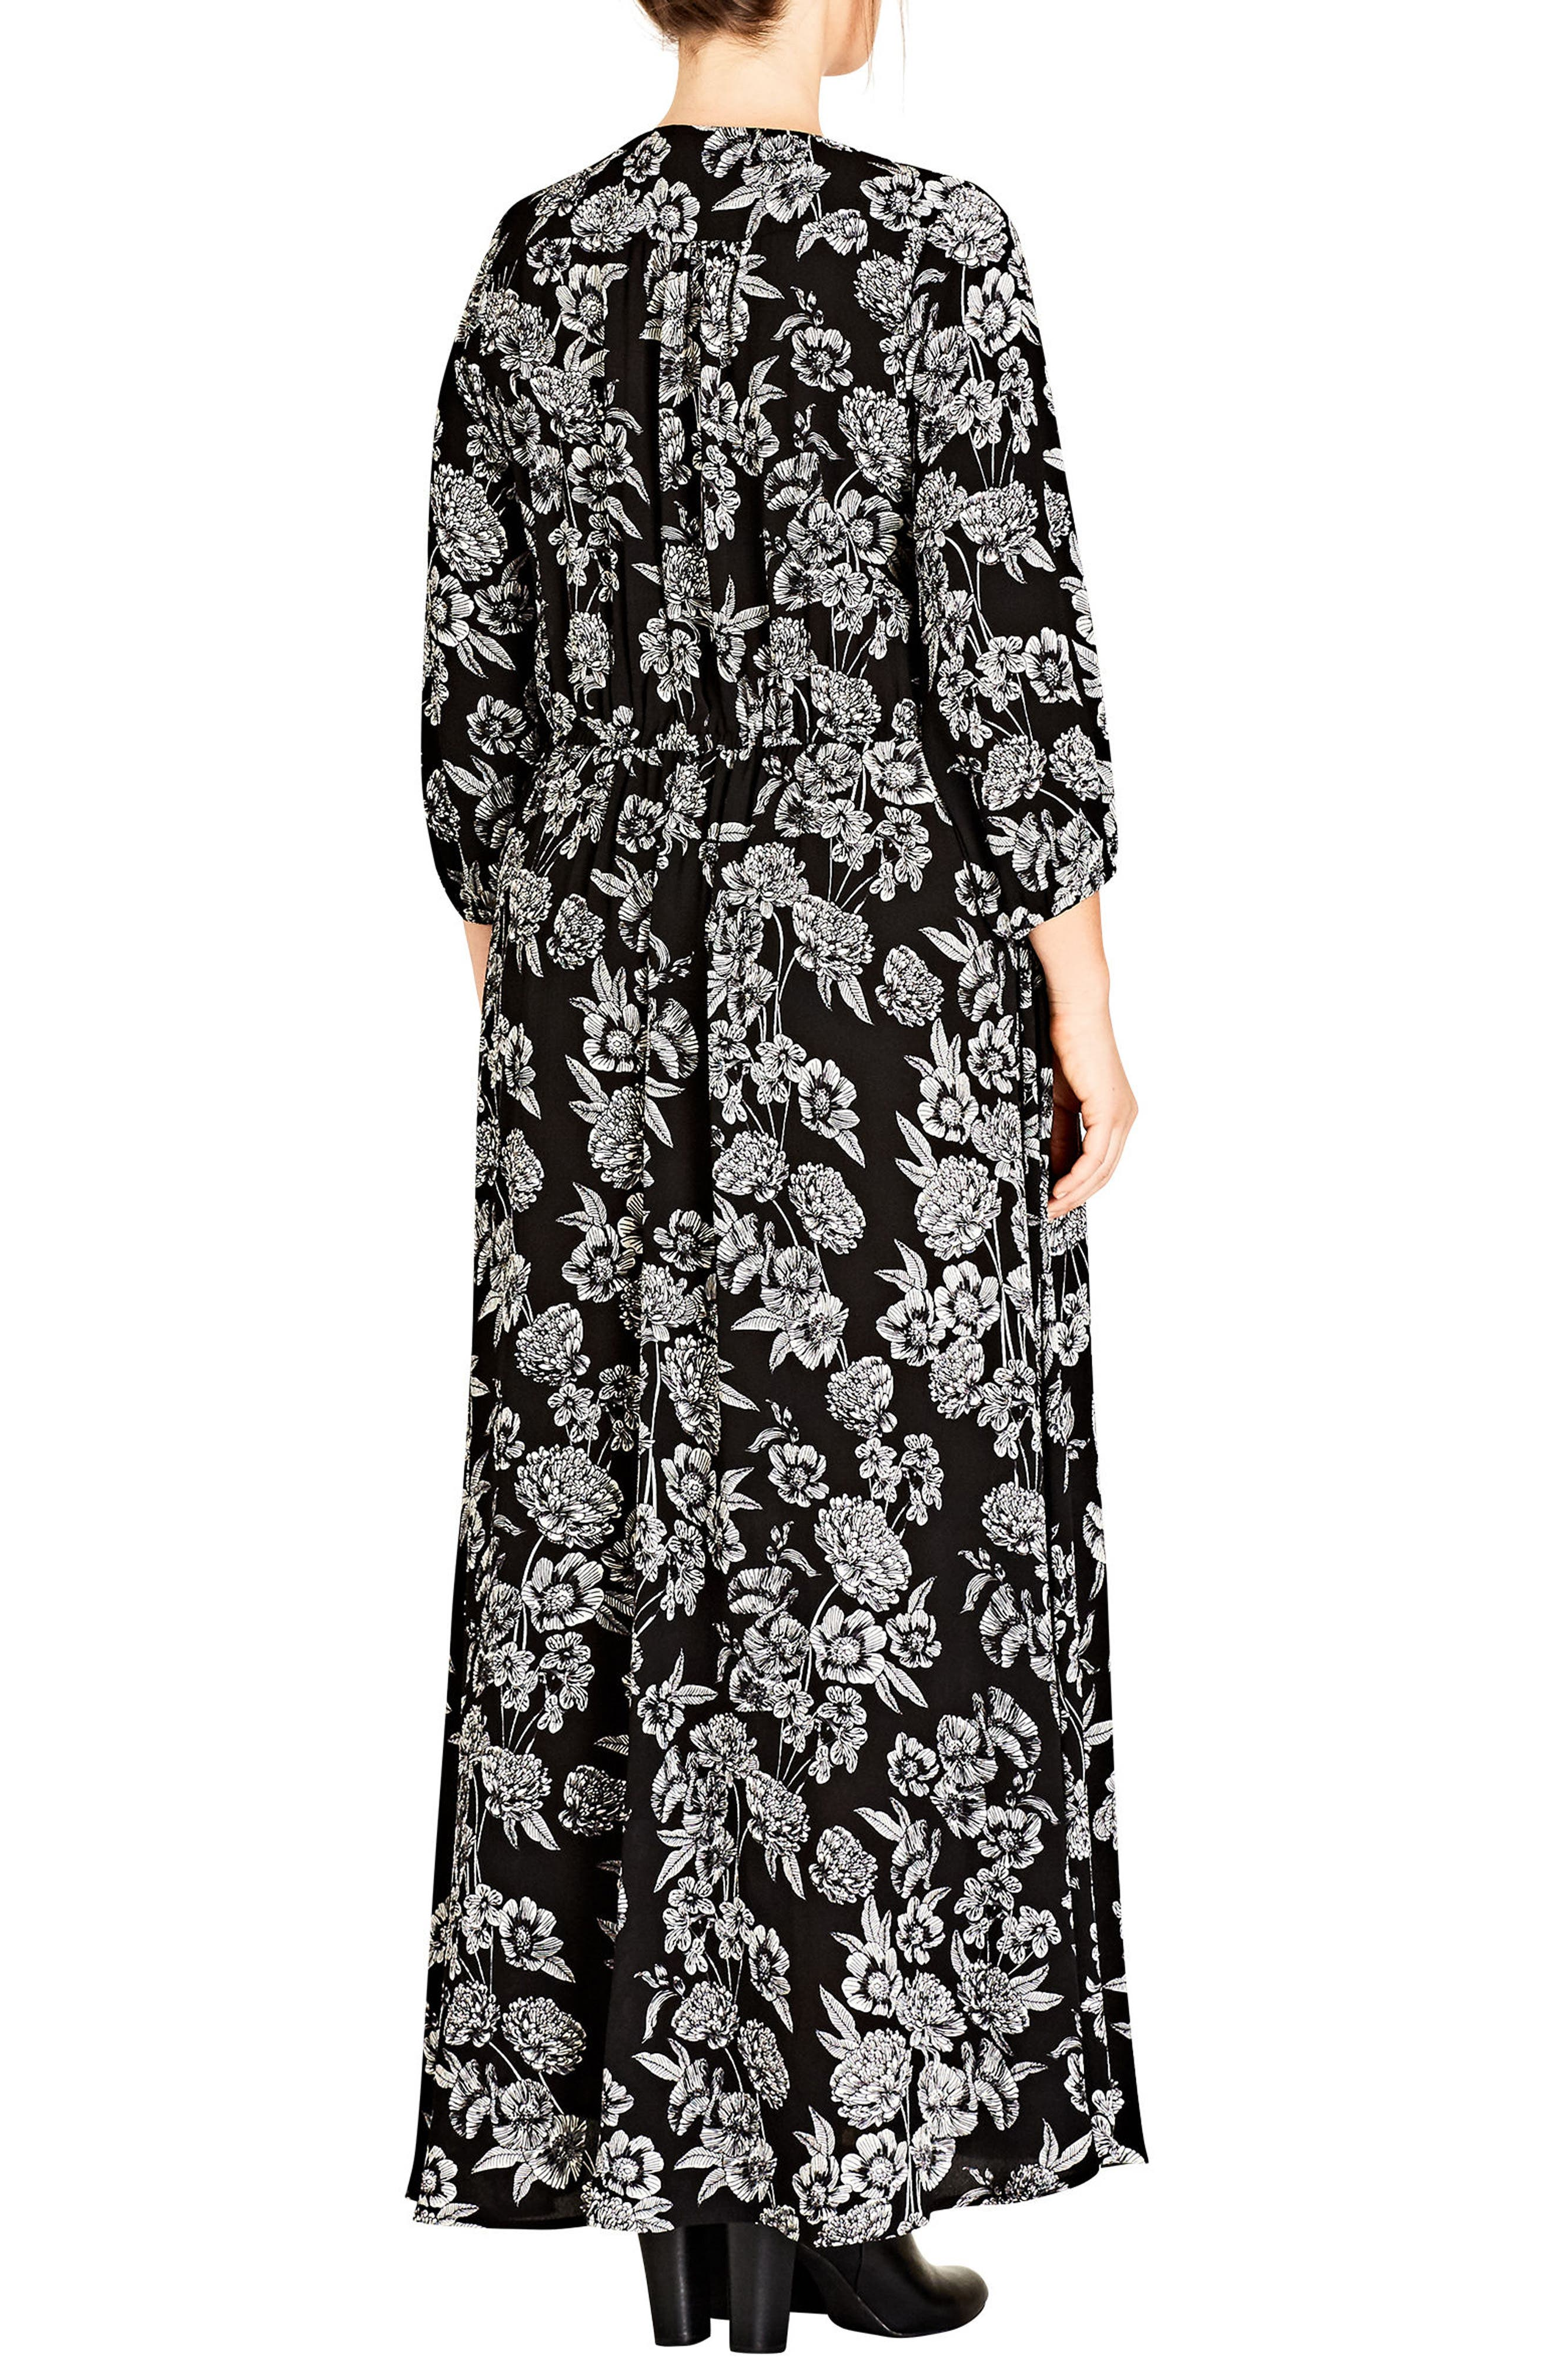 Bloomsbury Maxi Dress,                             Alternate thumbnail 2, color,                             001